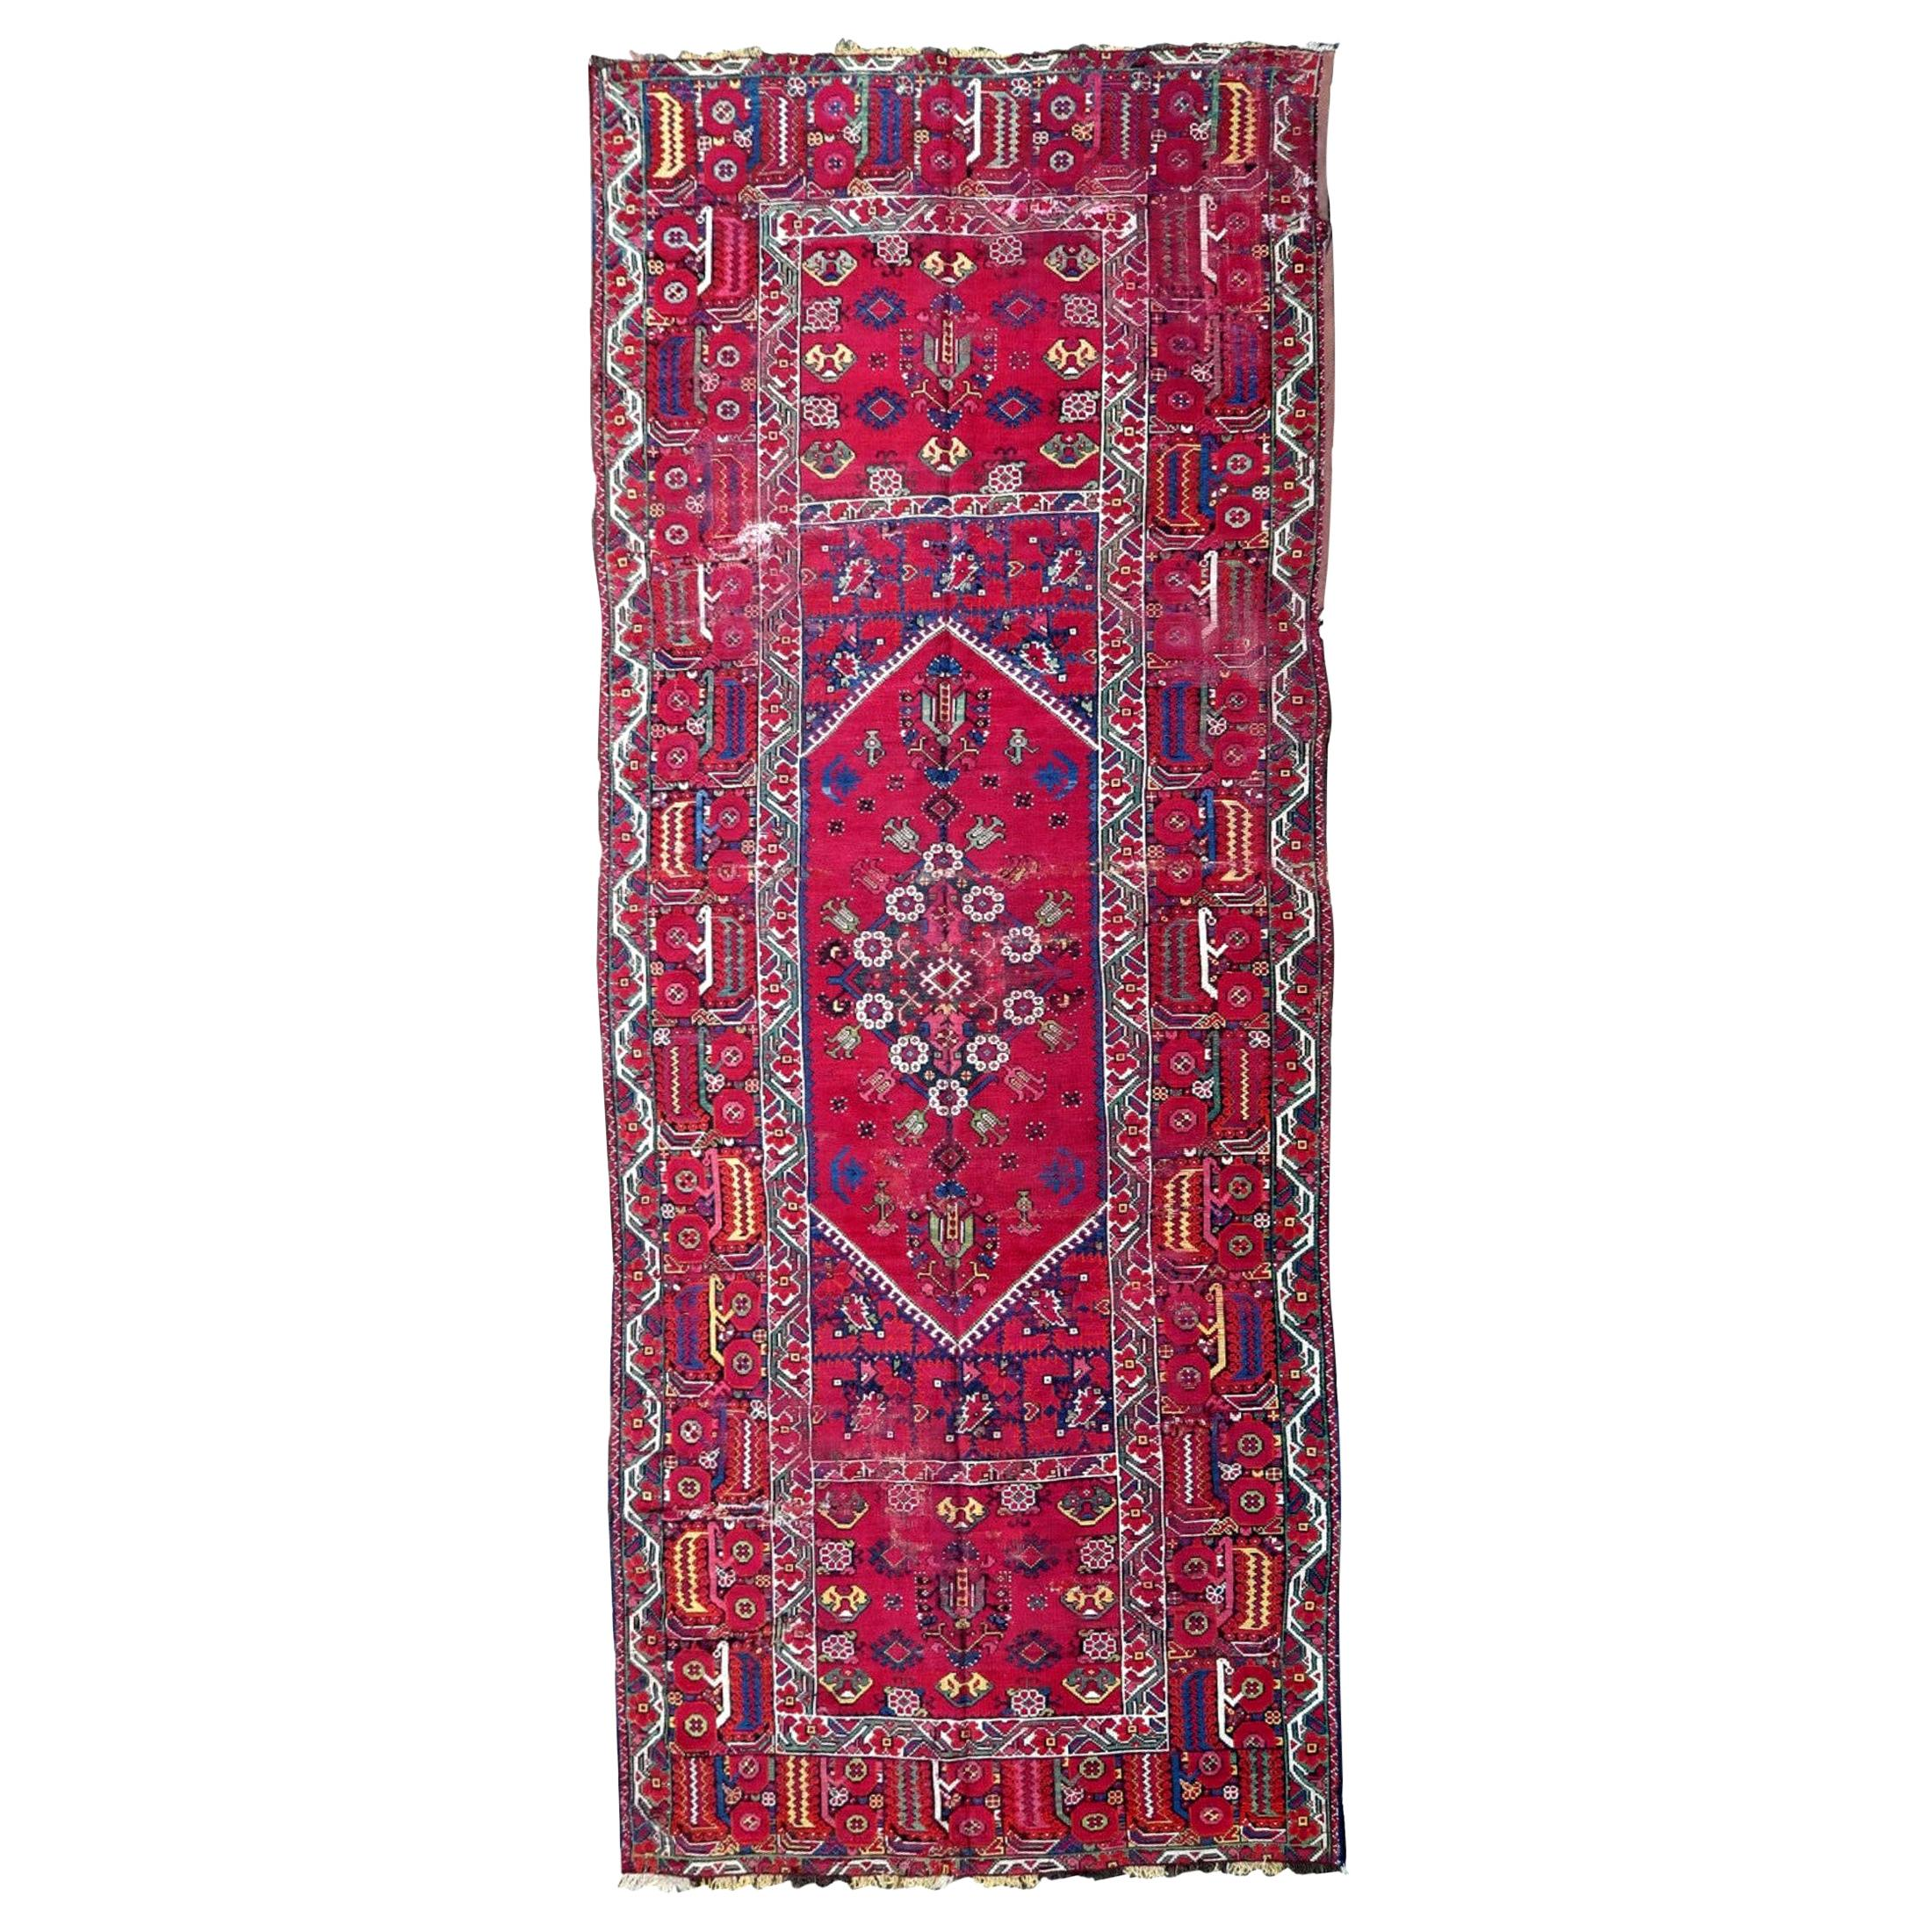 Handmade Antique Algerian Berber Collectible Rug, 1830s, 1P85